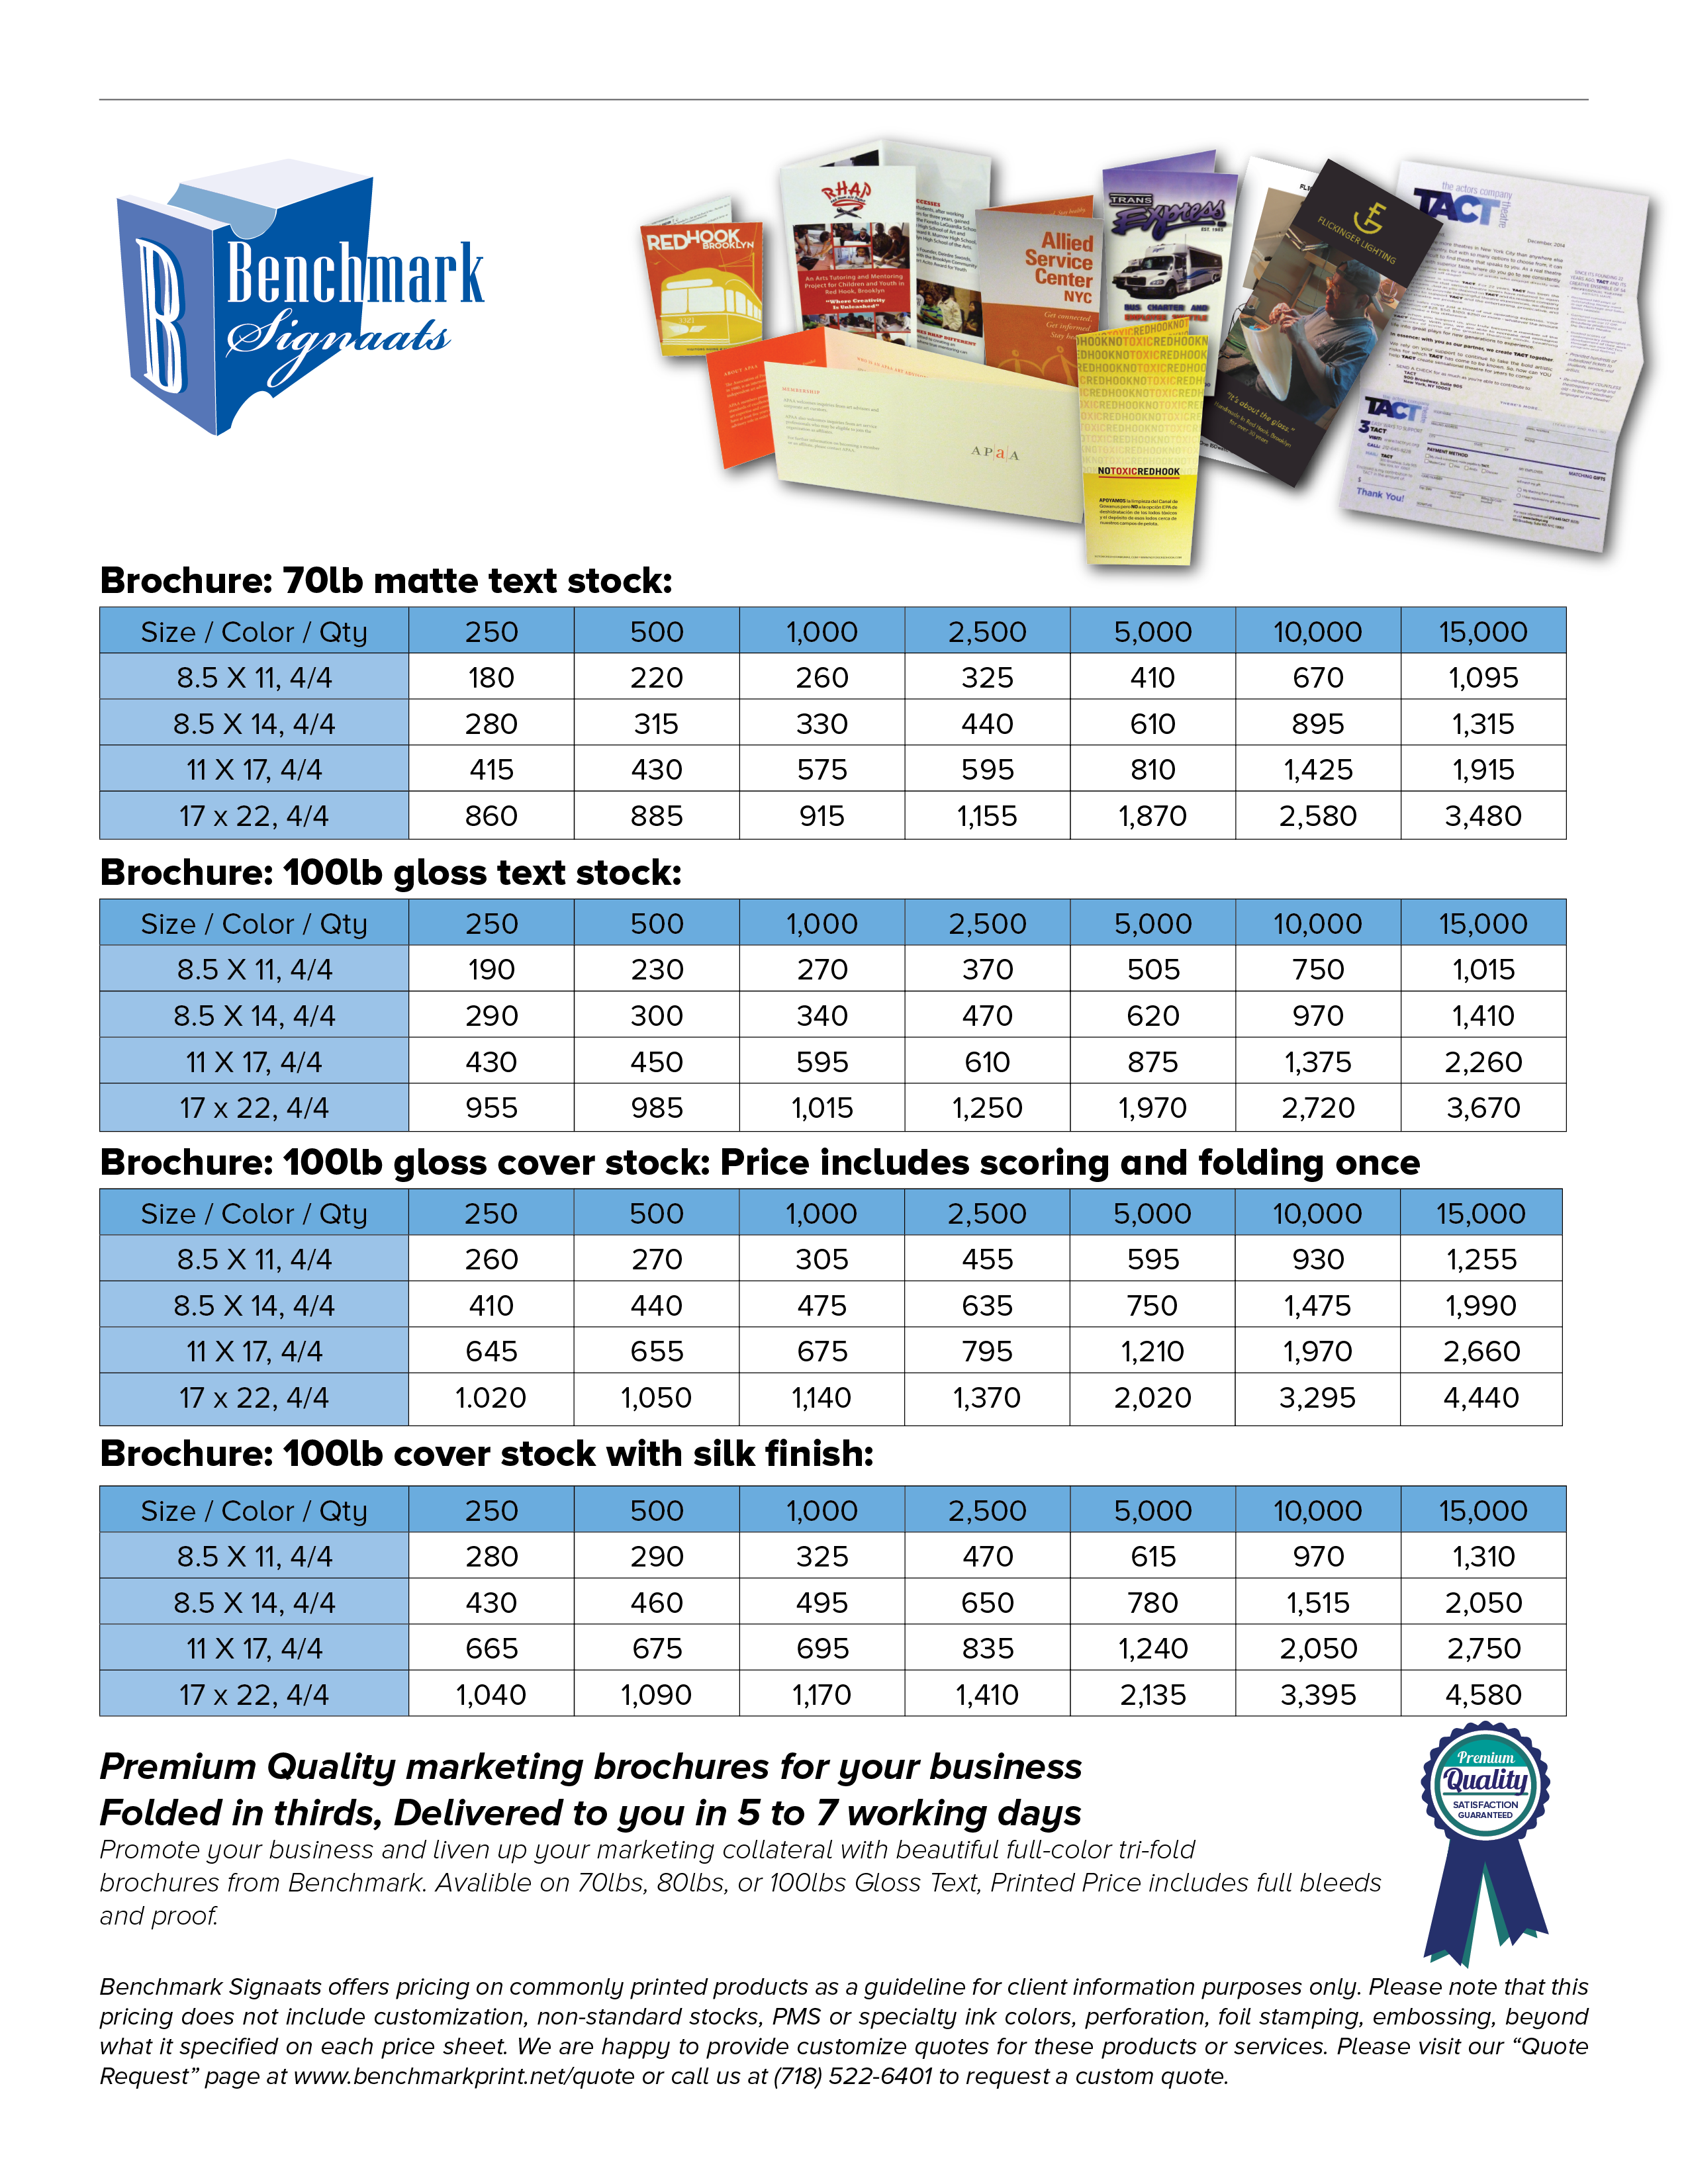 brochure pricing benchmark signaats